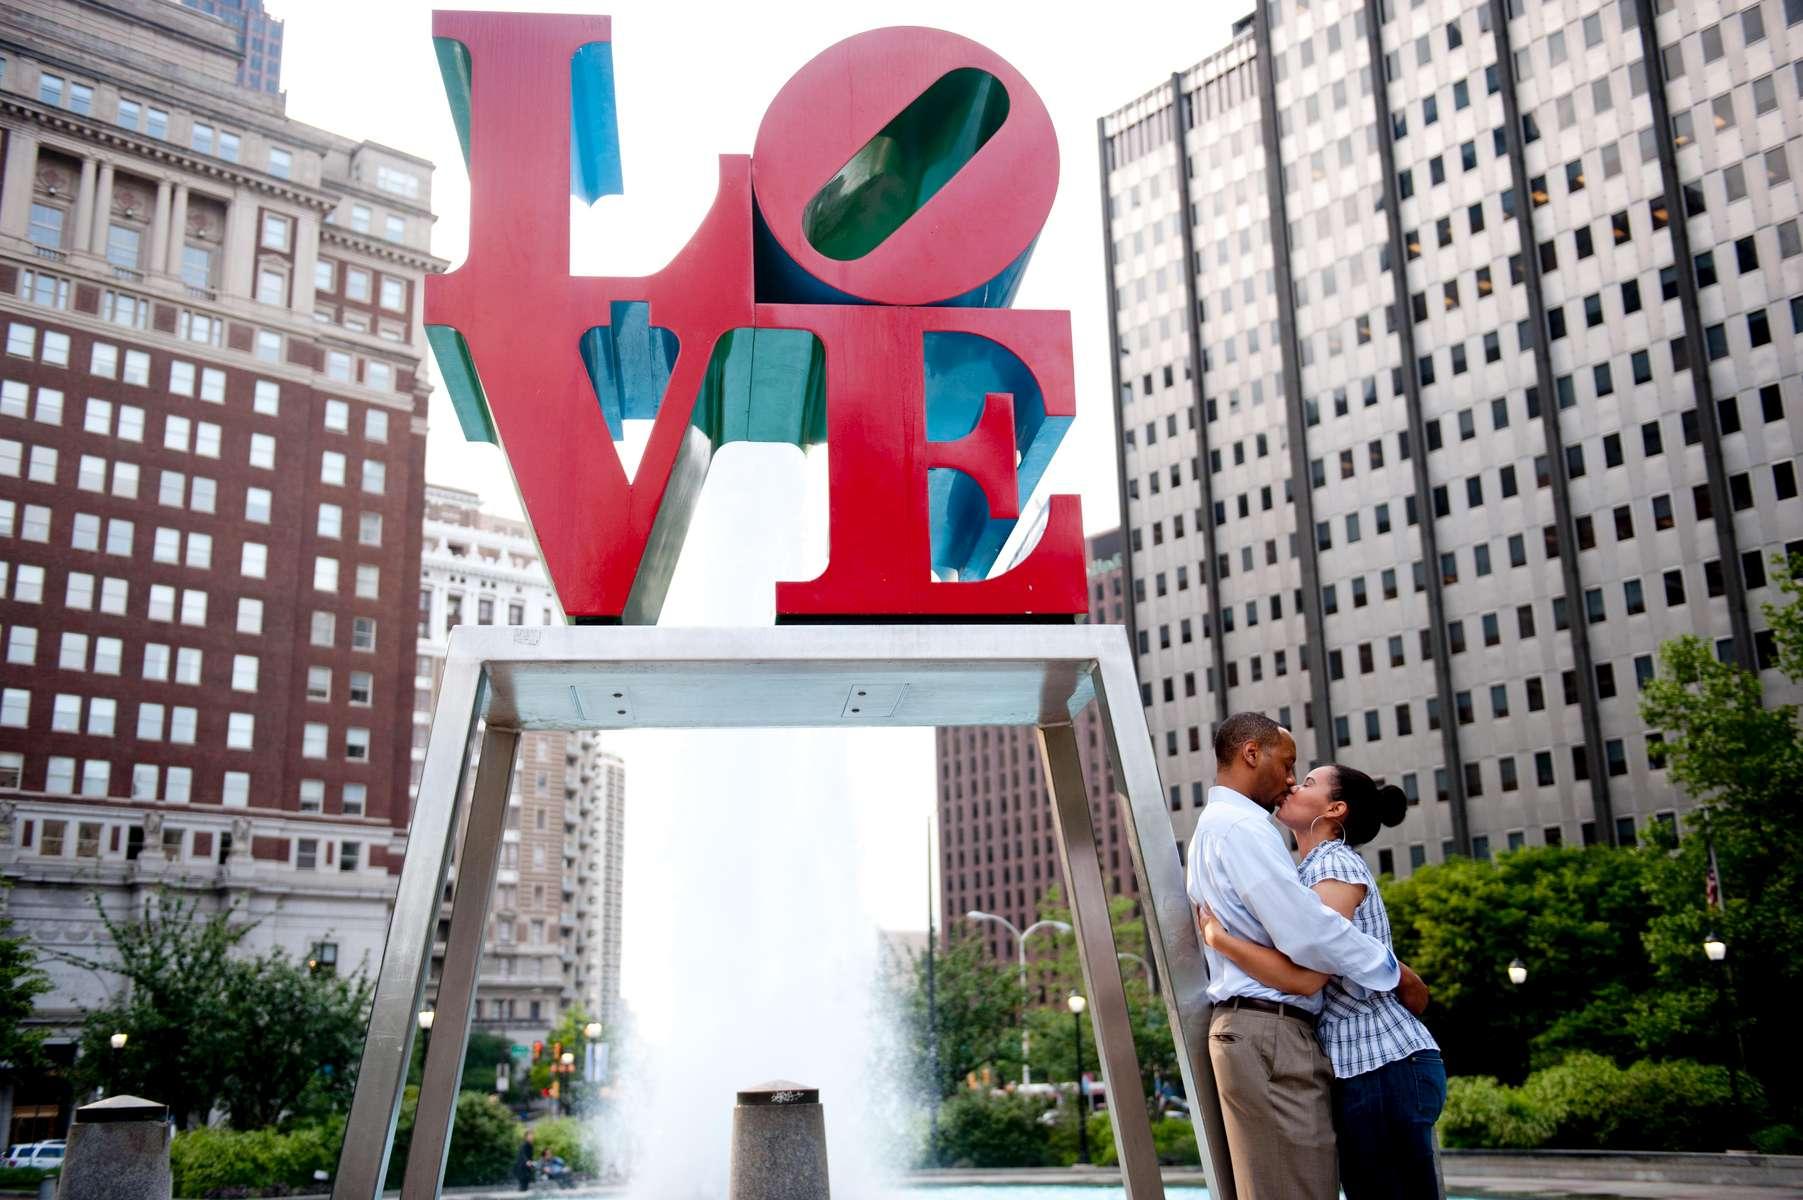 LOVE PARK, PHILADELPHIA, PA